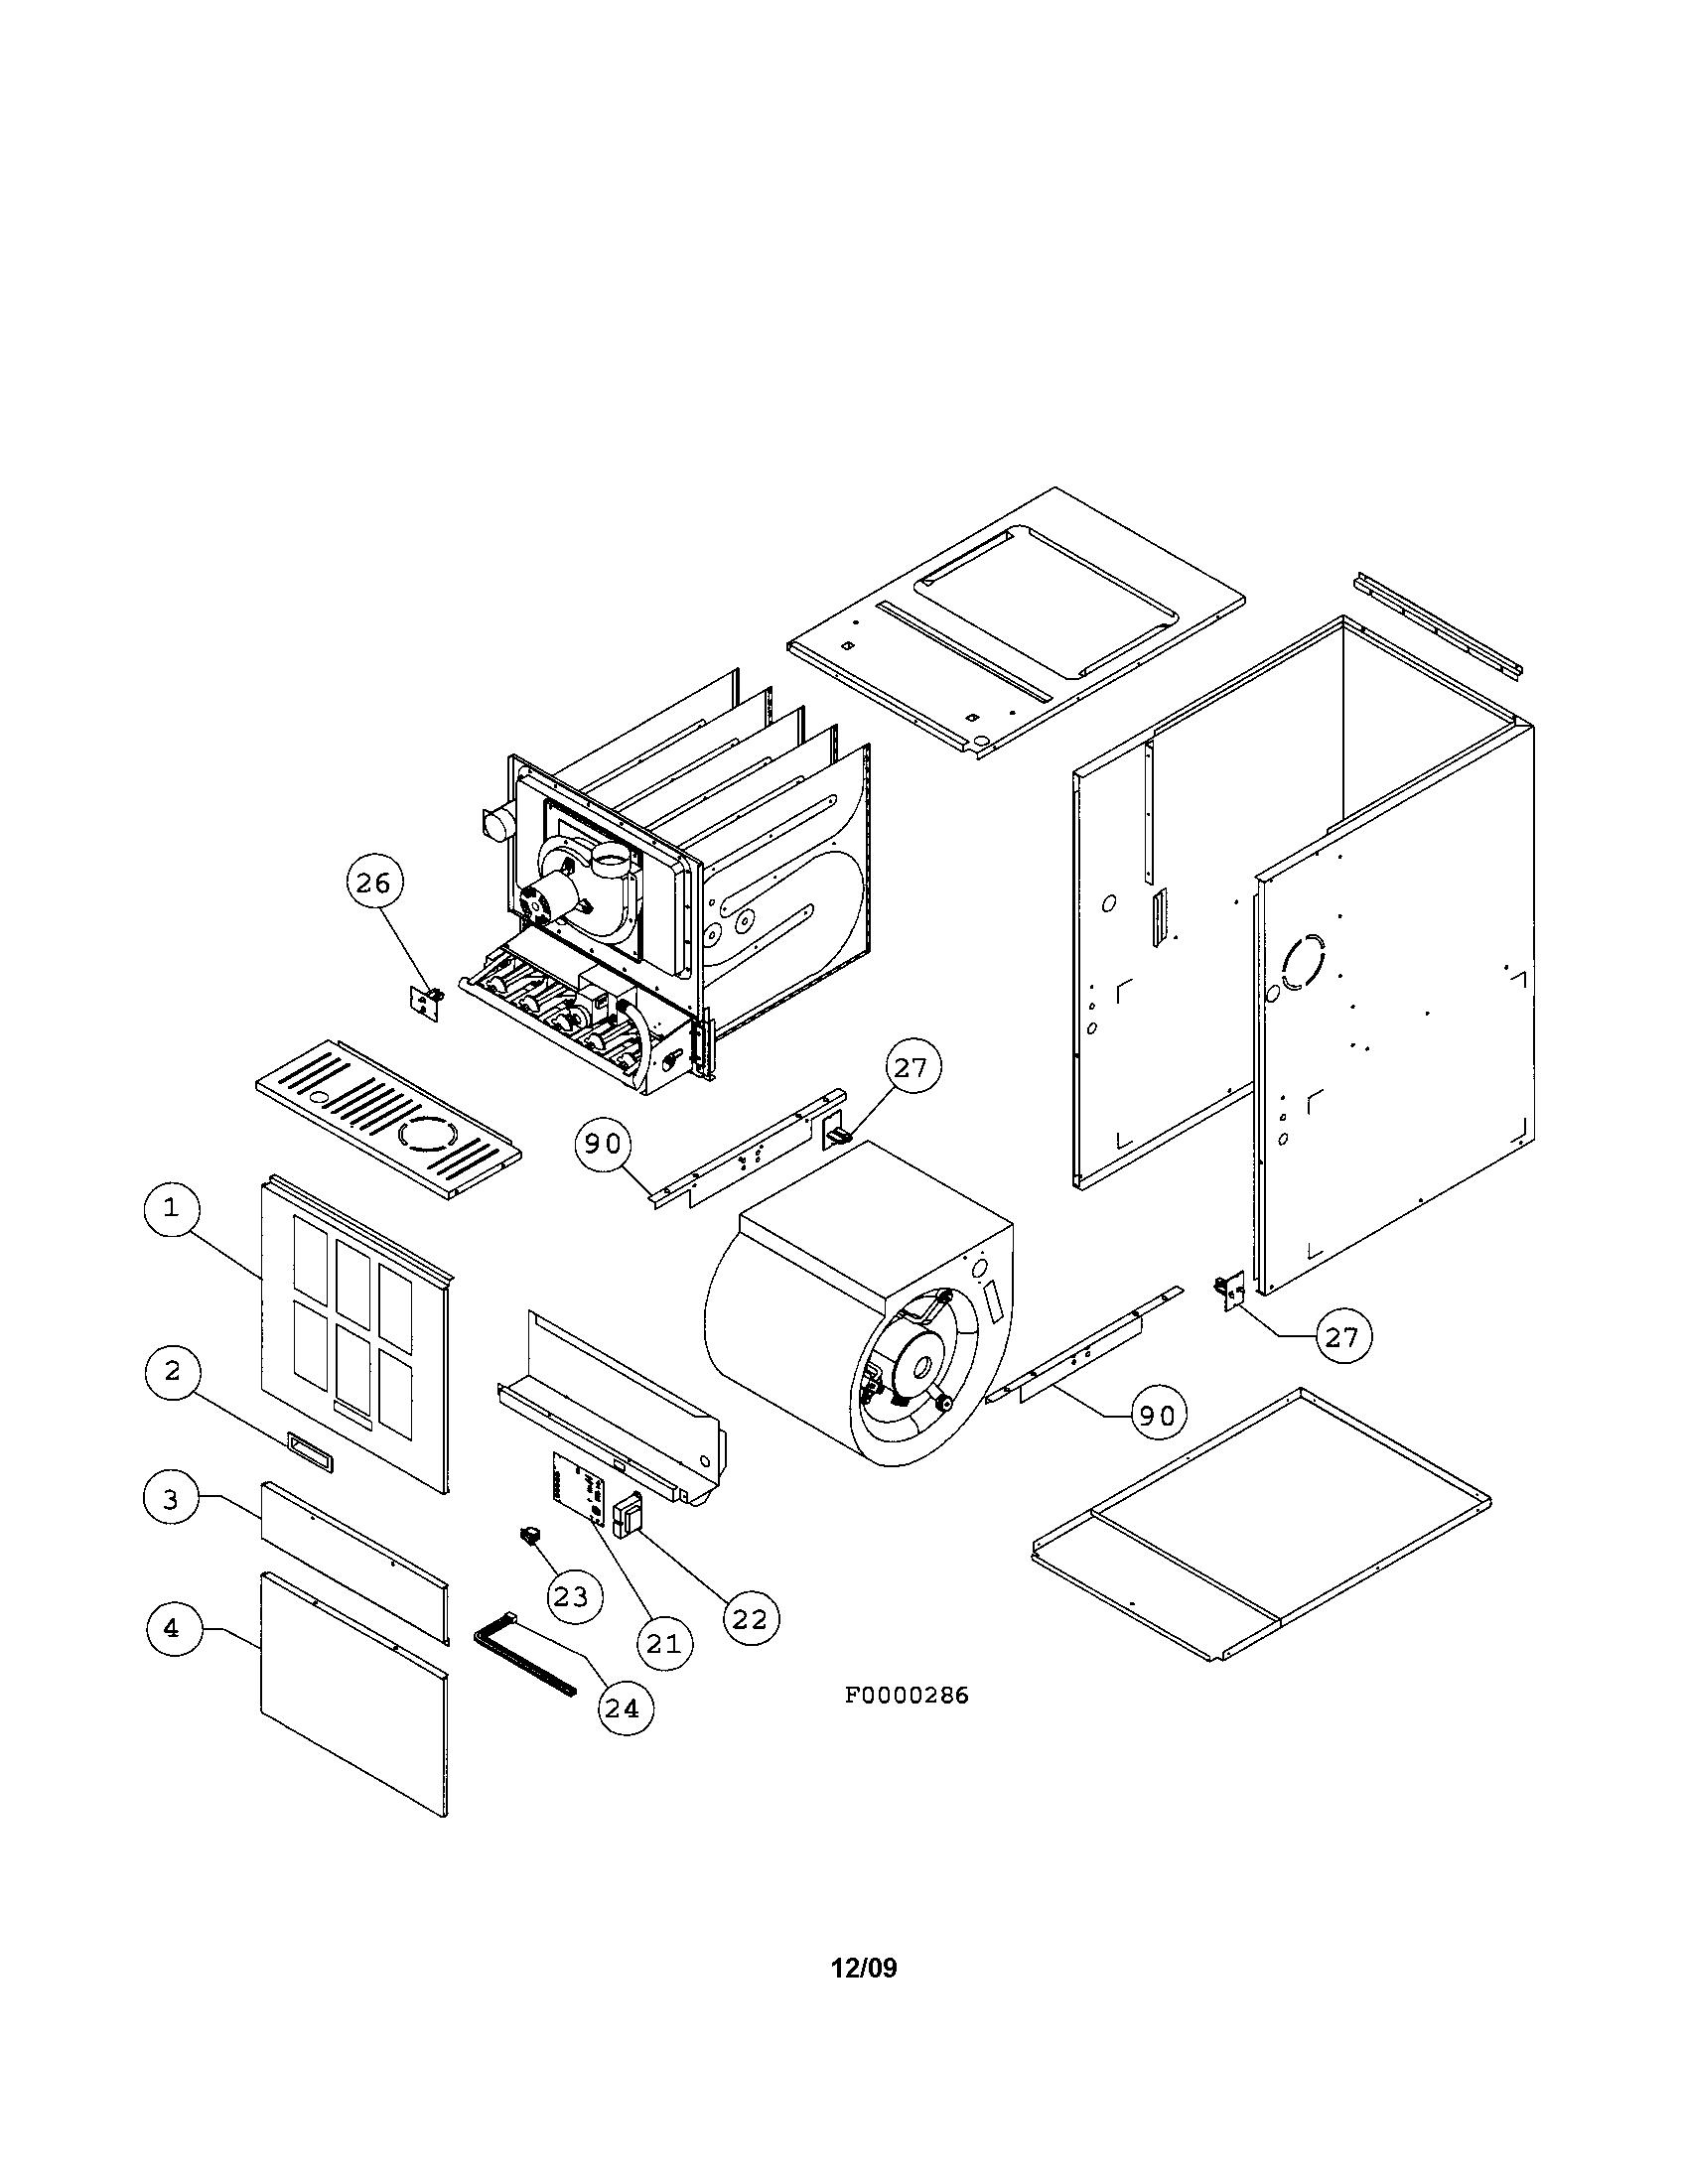 Furnace Parts: June 2015